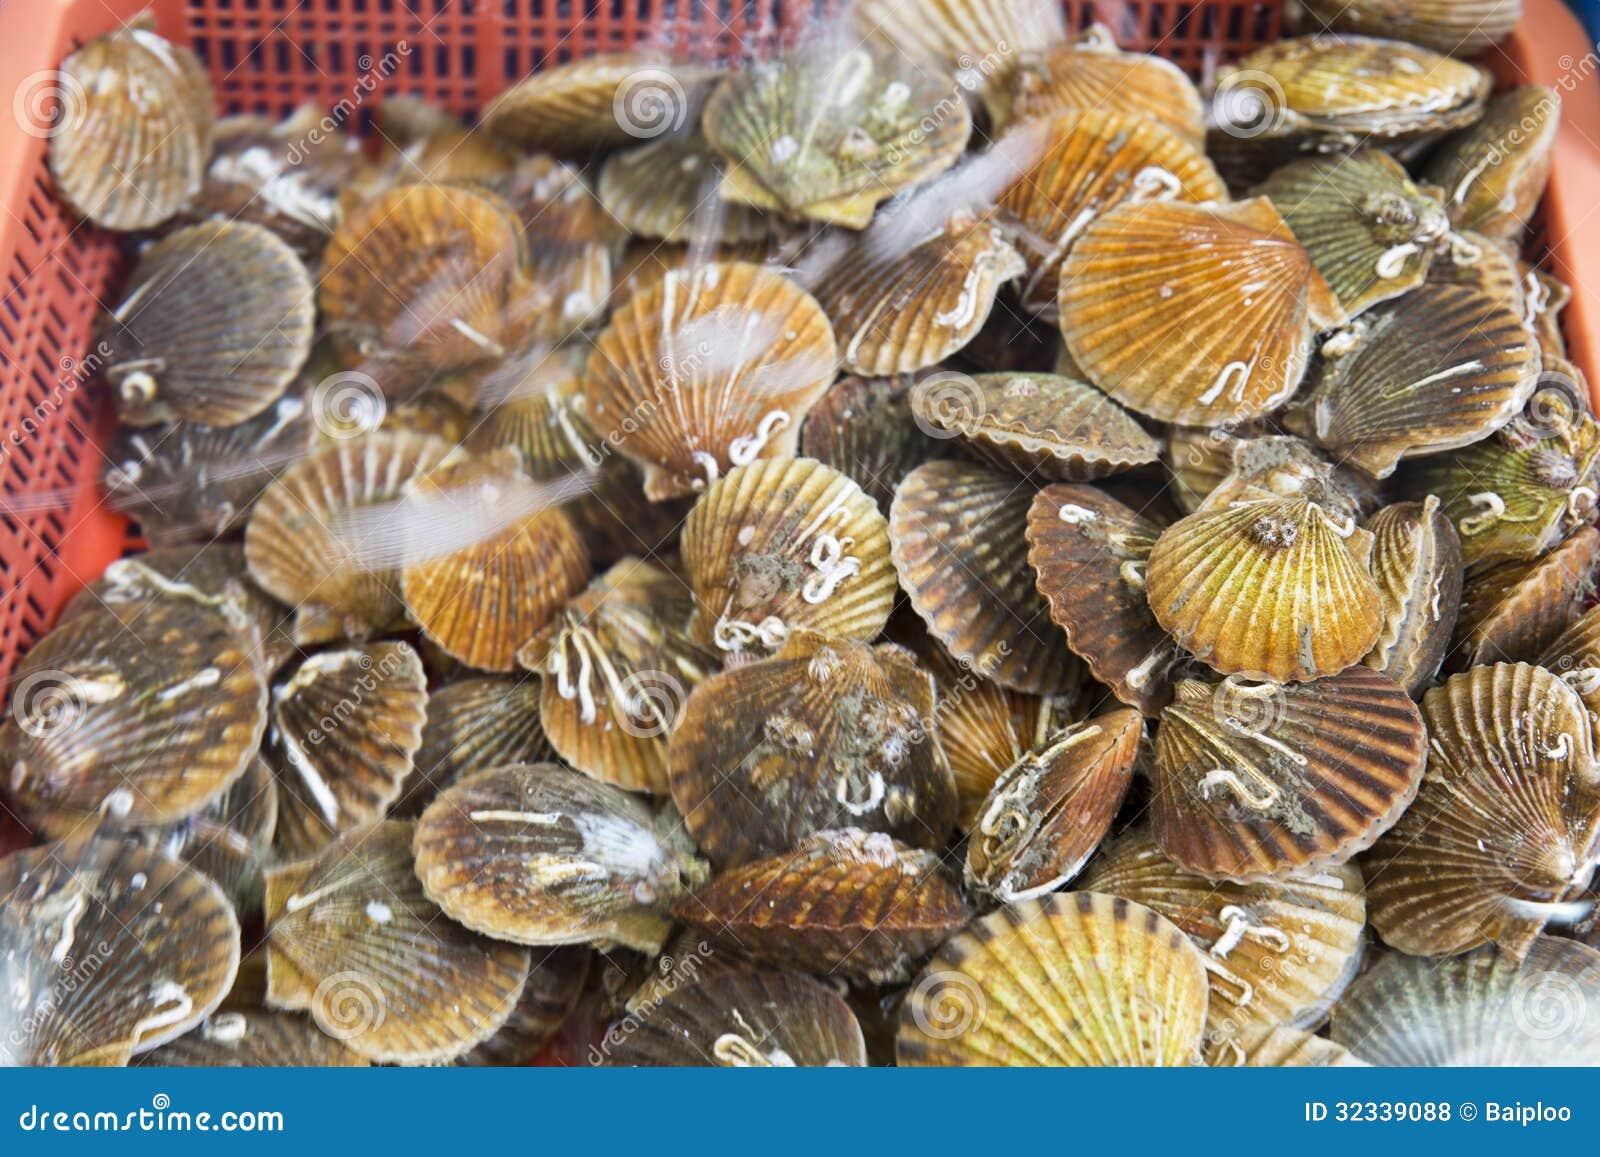 Freshwater fish korea - Bivalvia For Sale At Fish Market South Korea